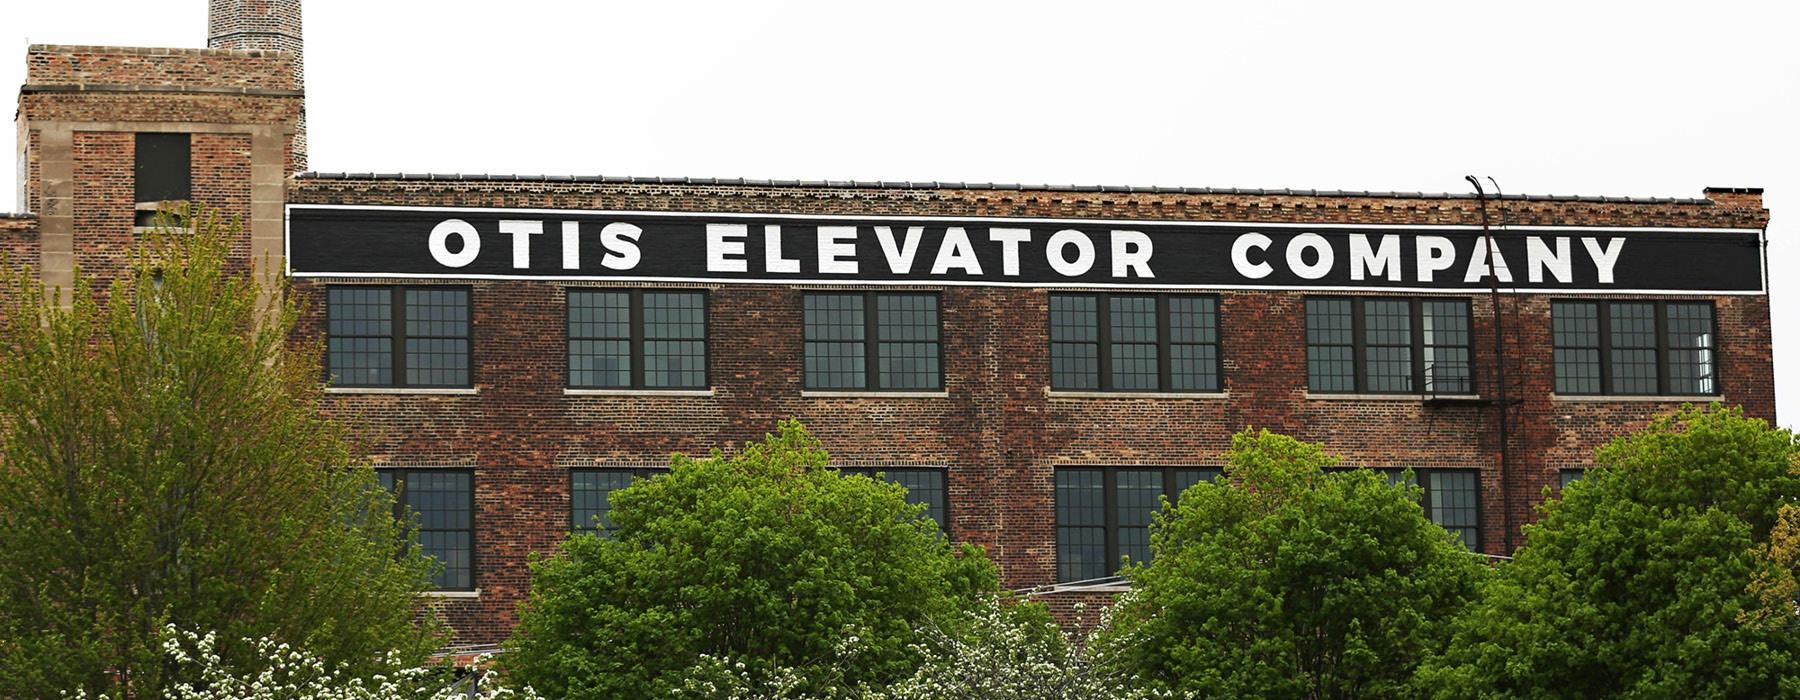 Otis Elevator Company sign across the newly renovated brick, Otis Apartment building